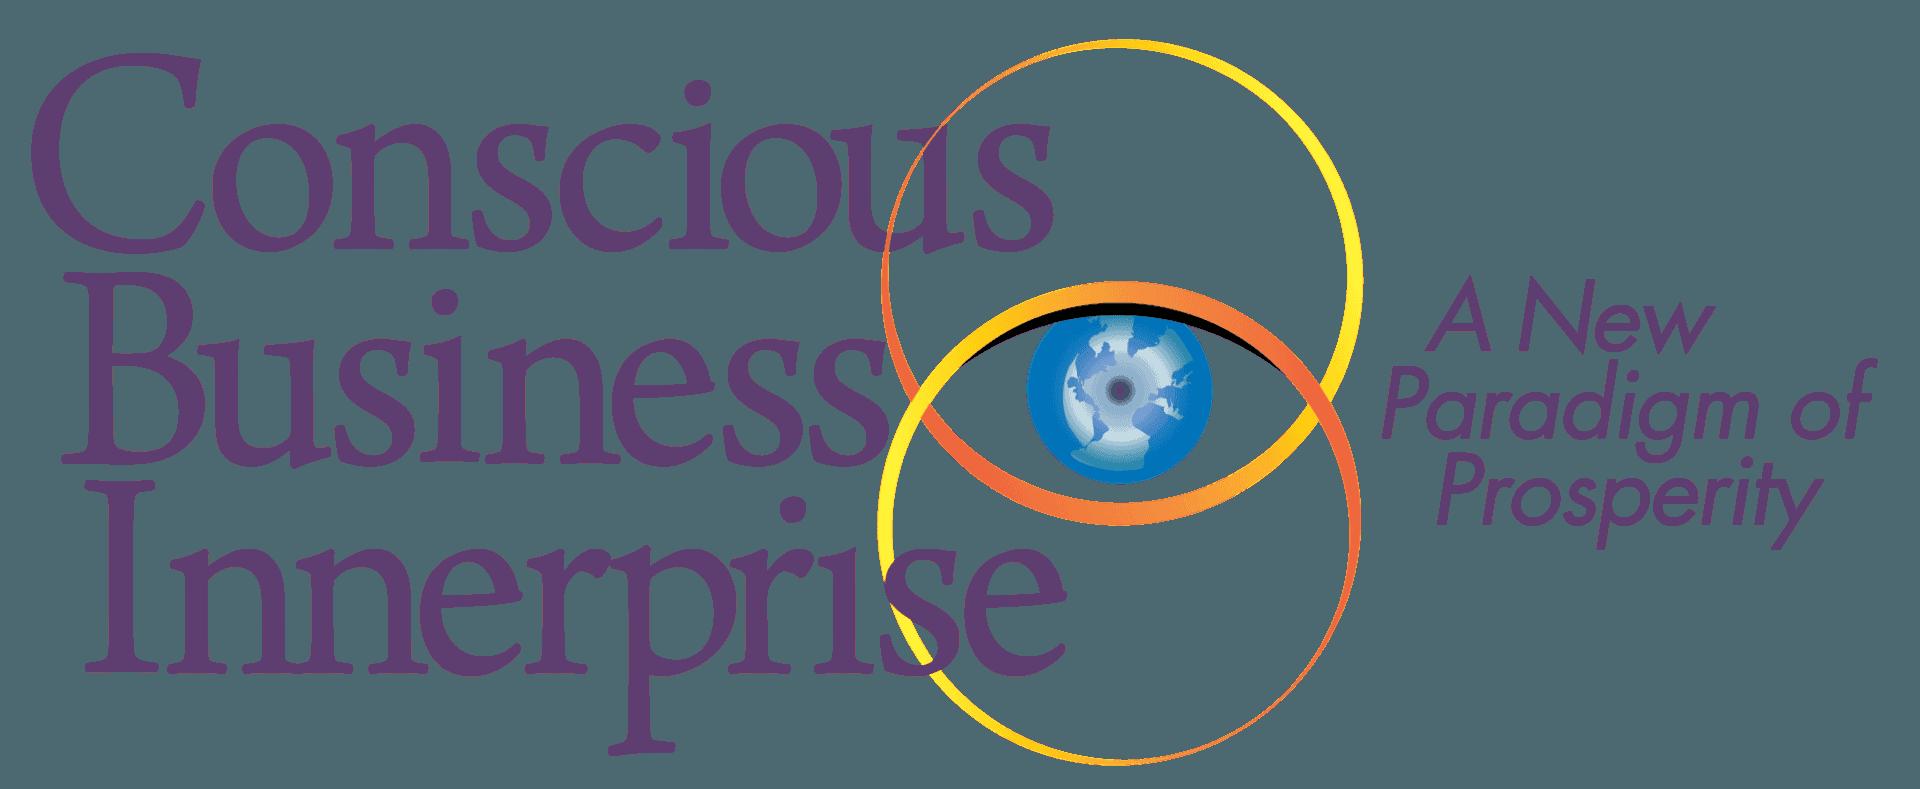 Conscious Business Declaration – A New Paradigm for Business